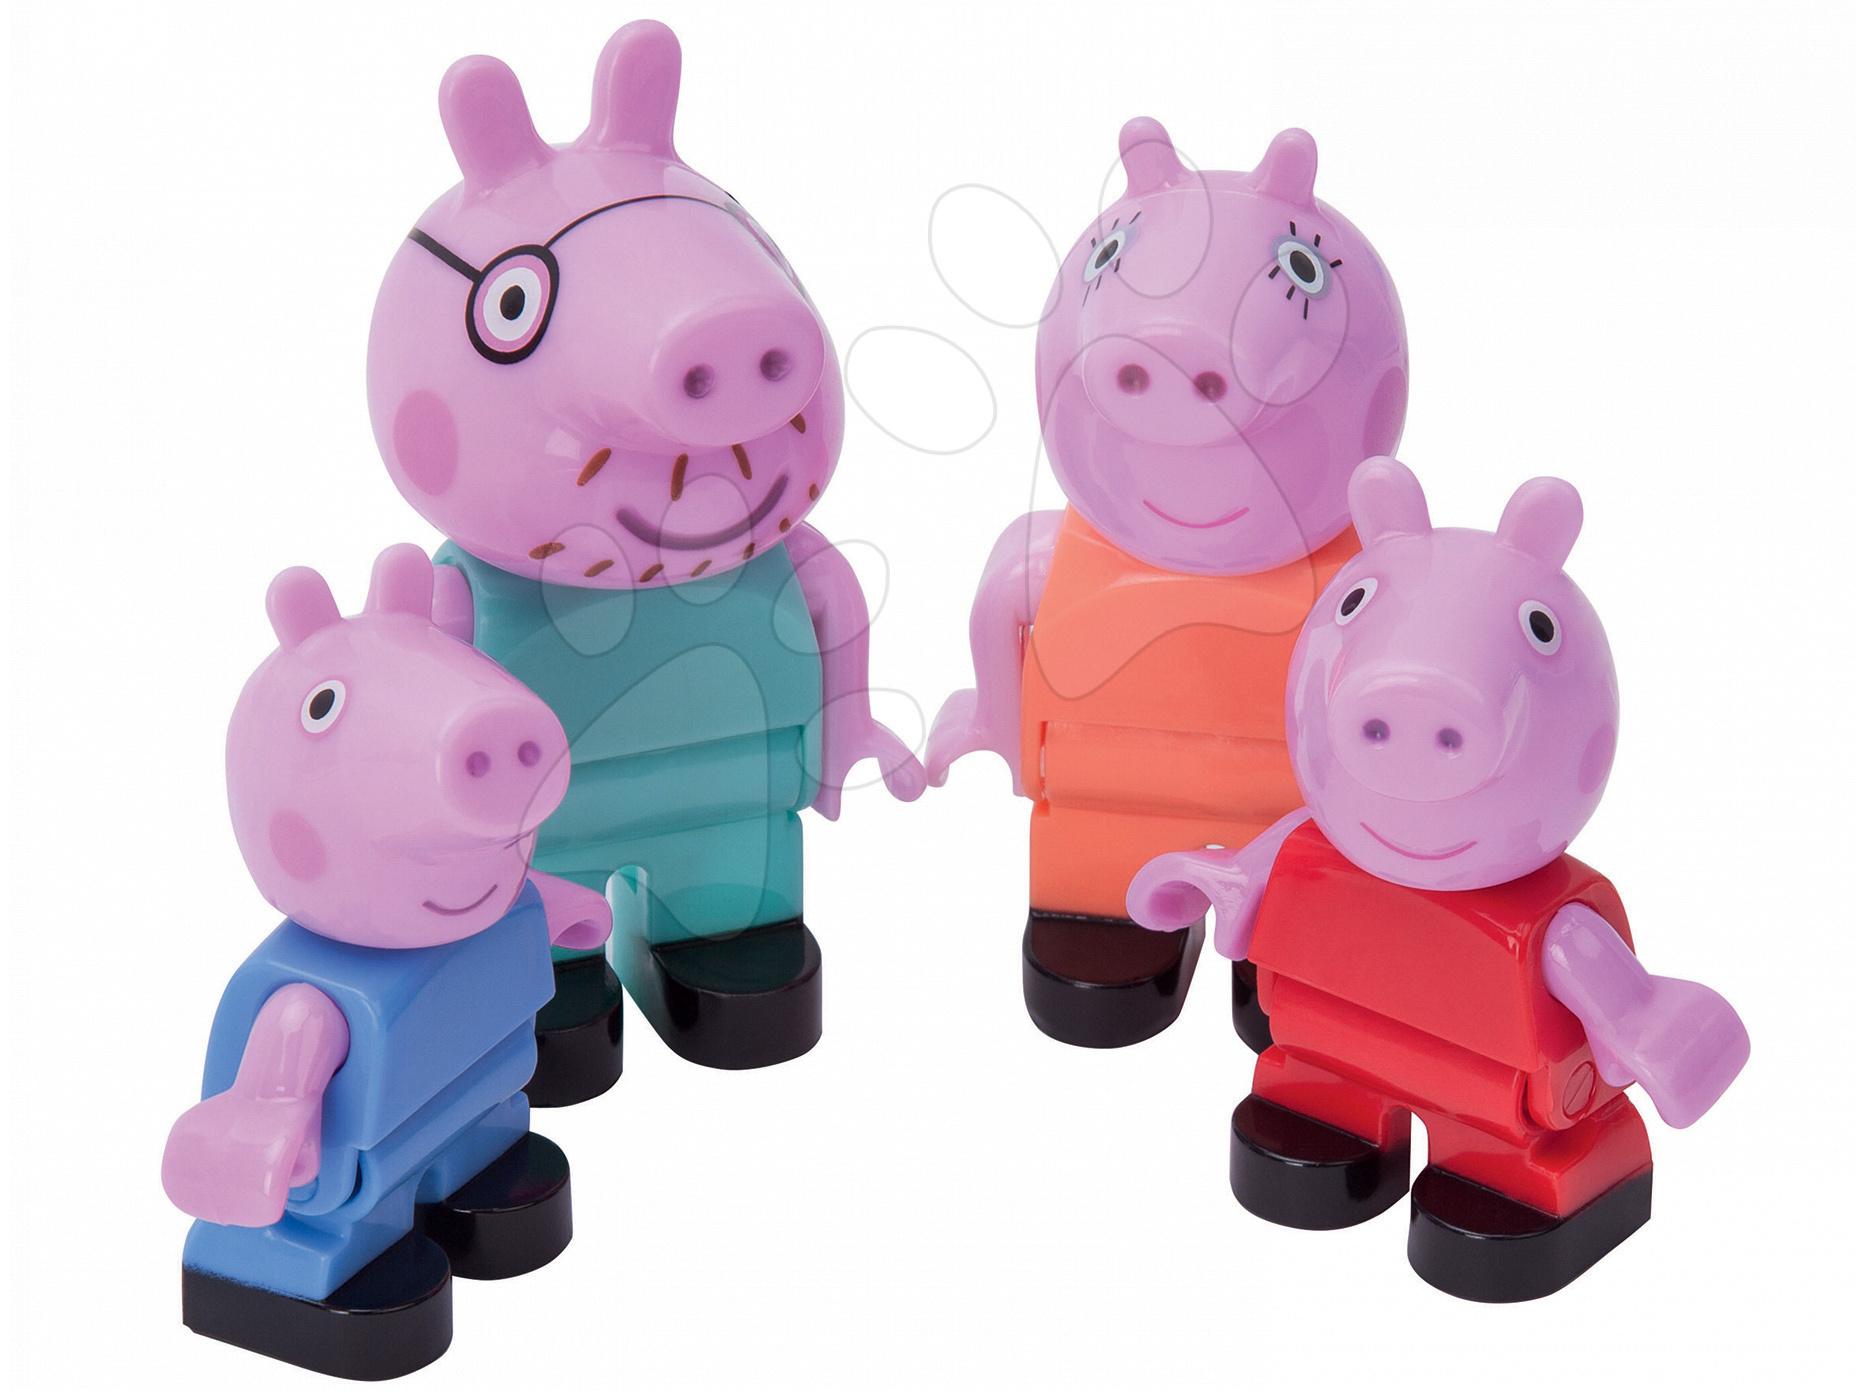 Figurky rodinka Peppa Pig PlayBIG Bloxx BIG 4 figurky